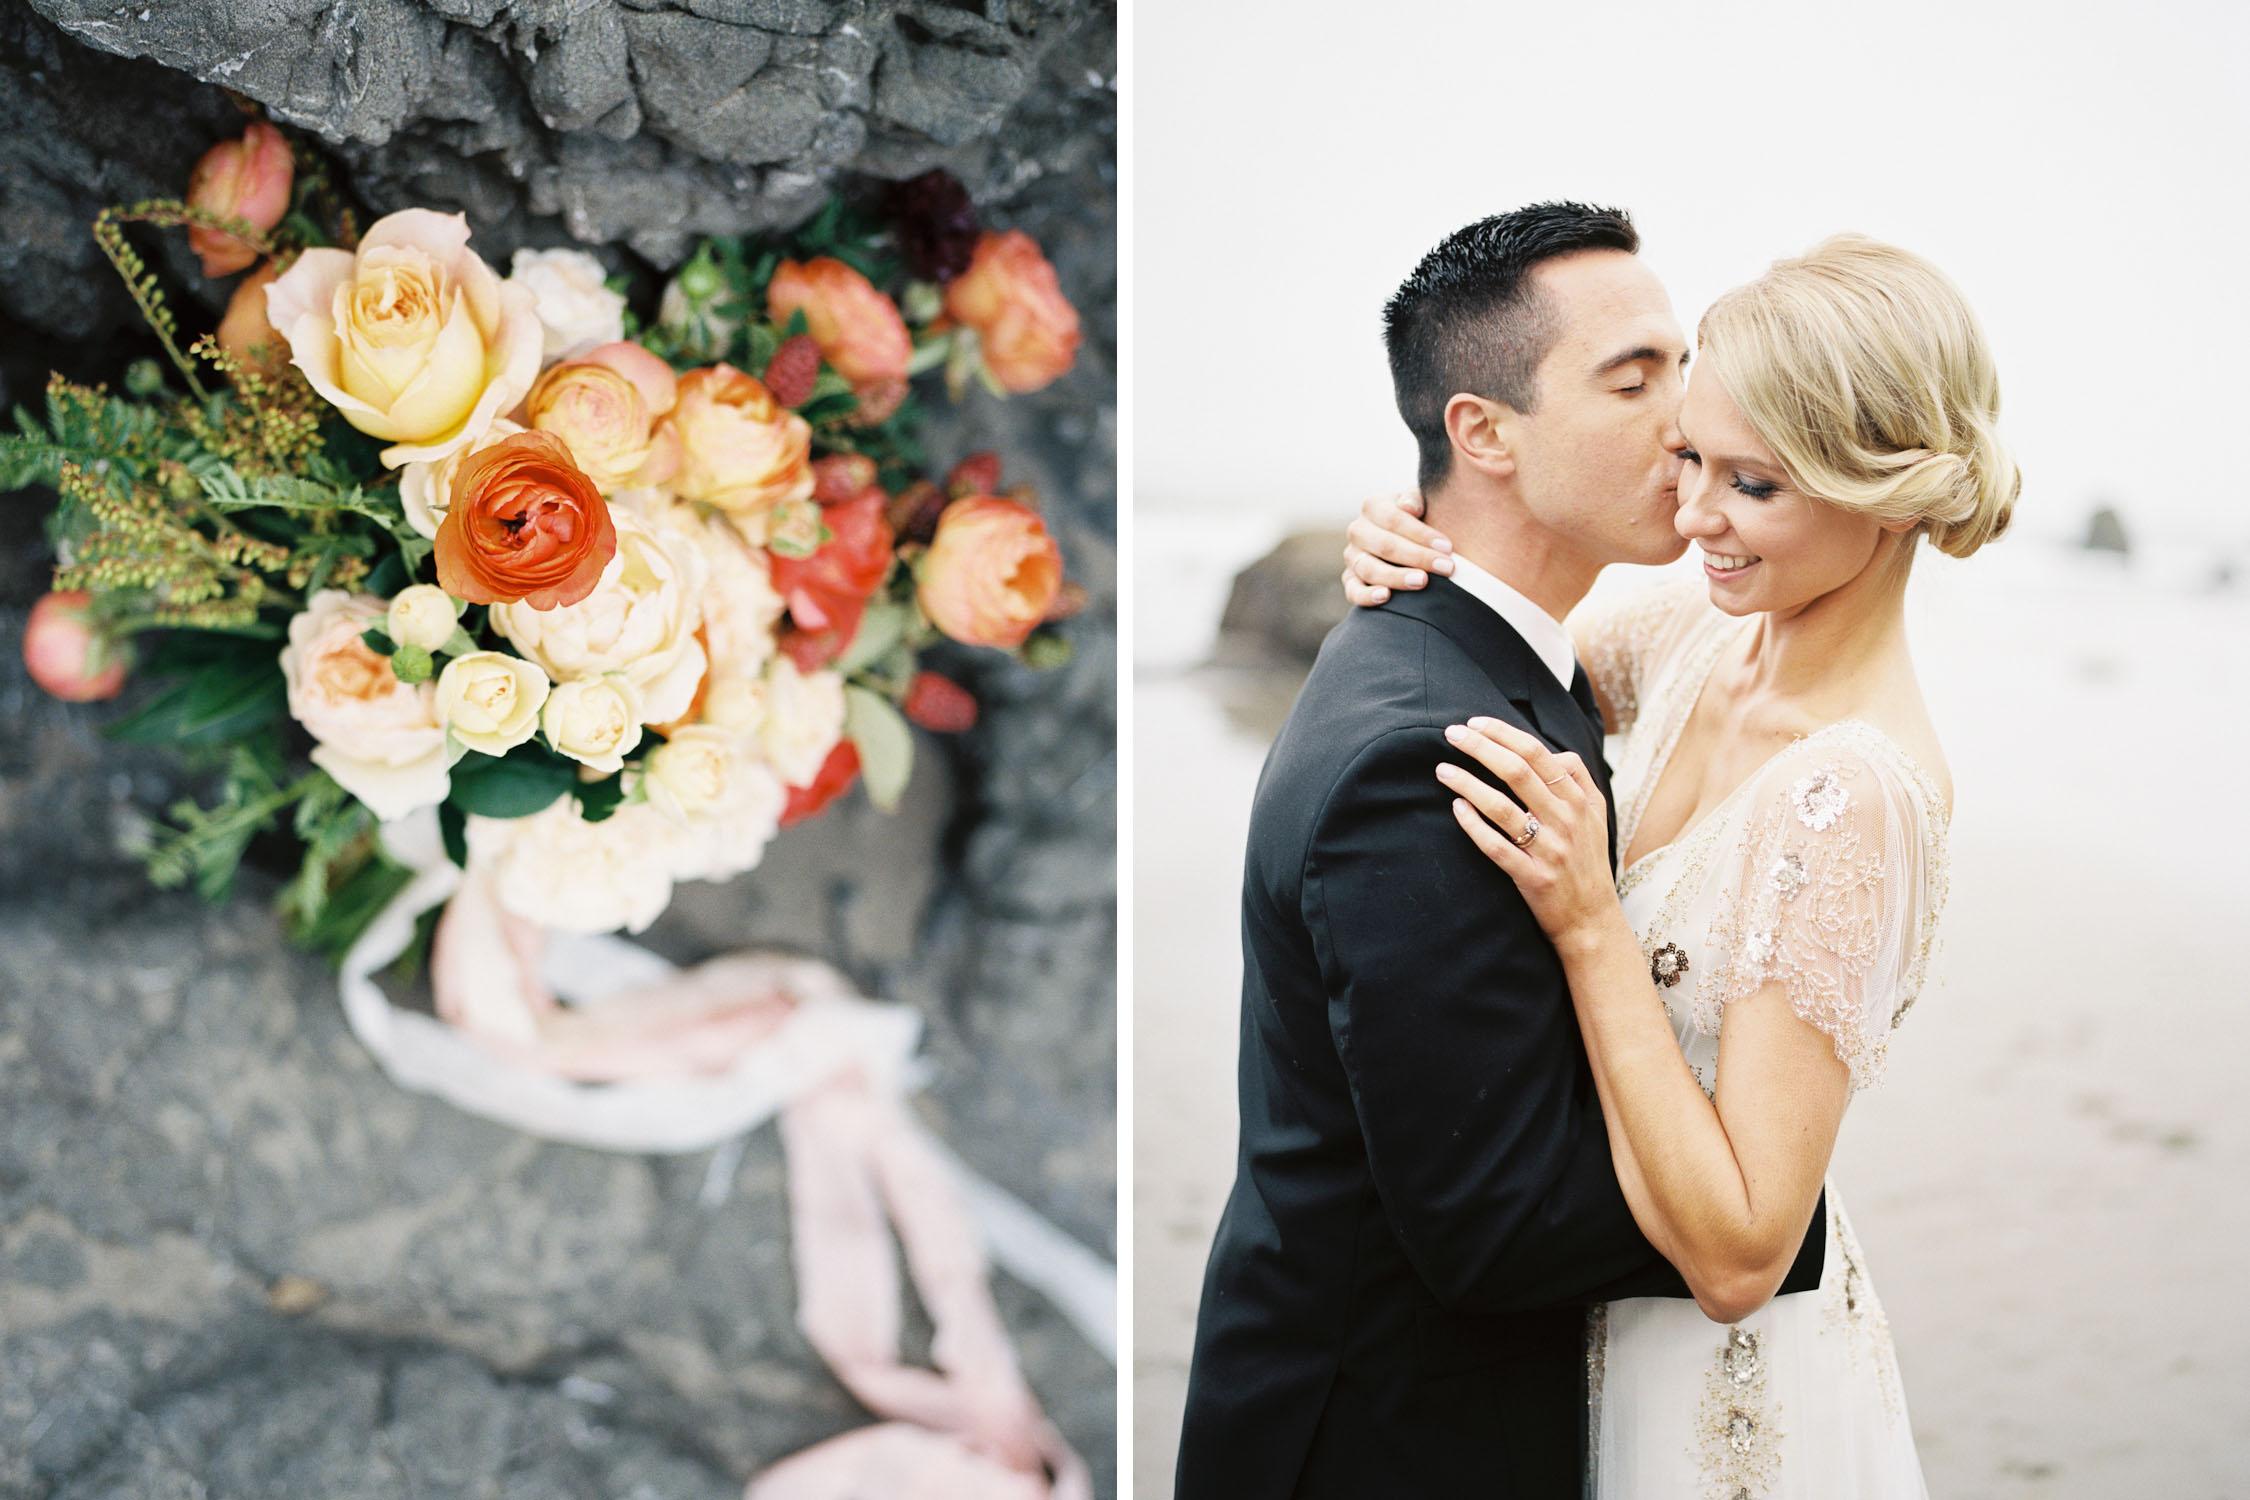 Bozeman-Montana-San Francisco-Bay Area-Wedding-Engagement-Photographer-2.jpg